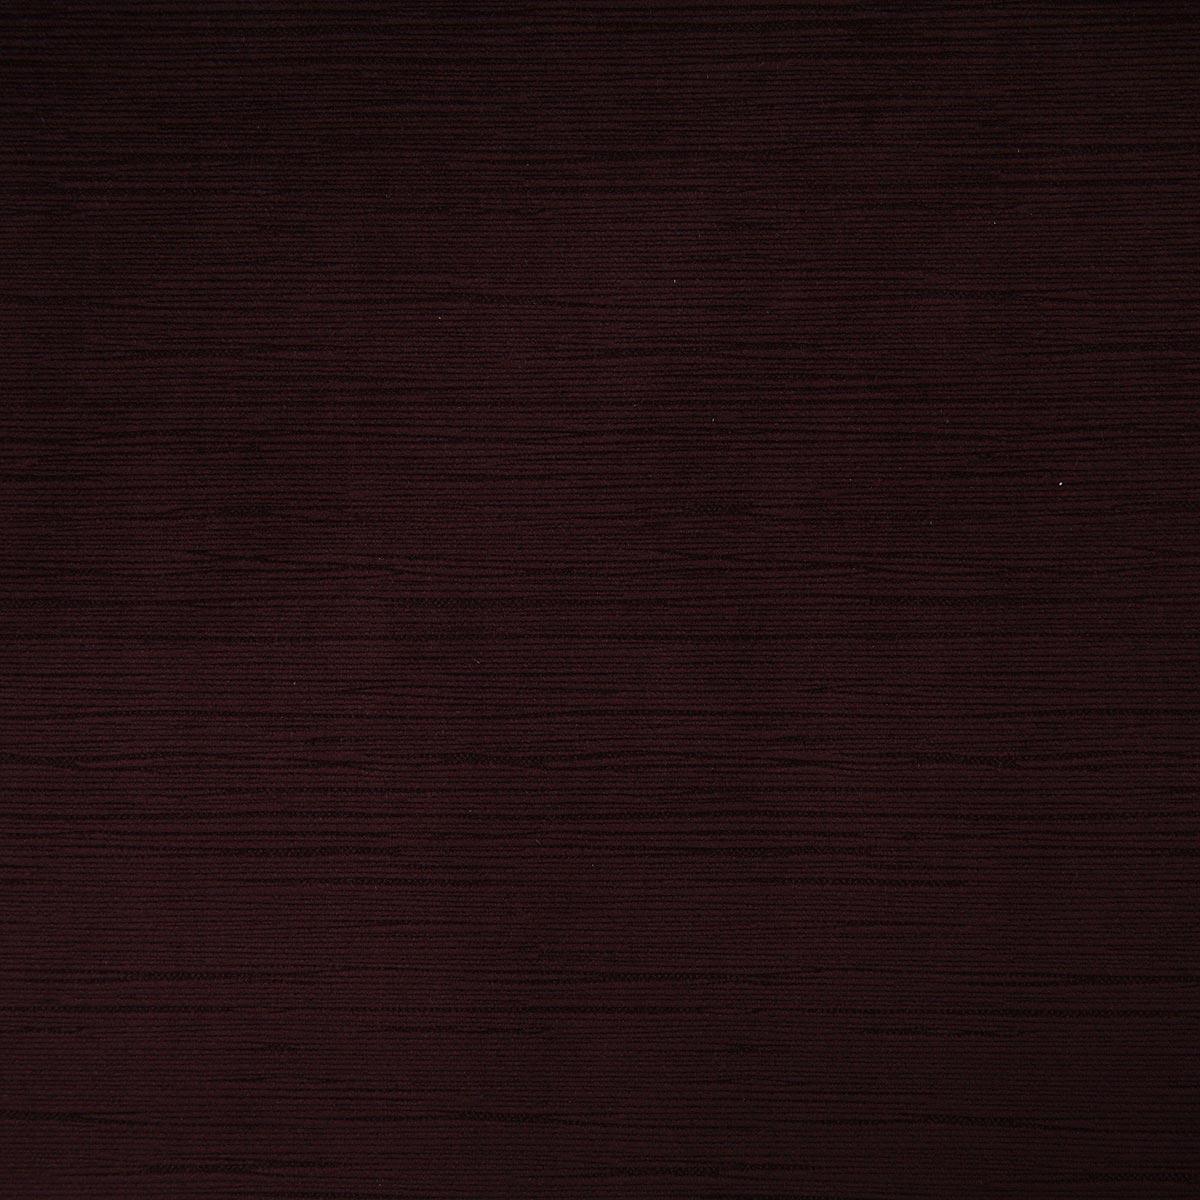 Elderberry 5847